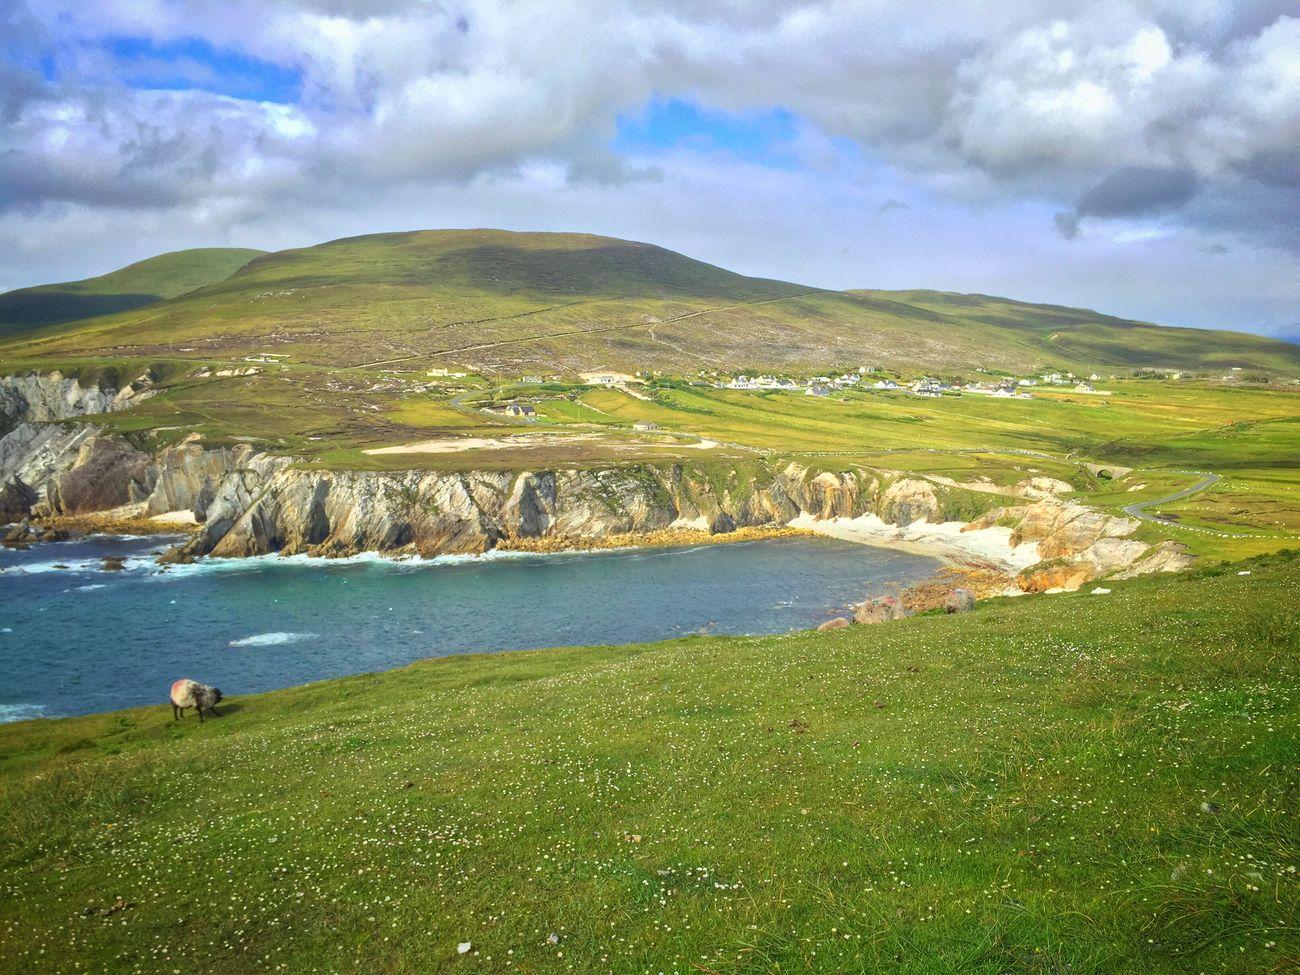 Achill Achill Island Mayo County Mayo Wild Atlantic Way Ireland Landscape